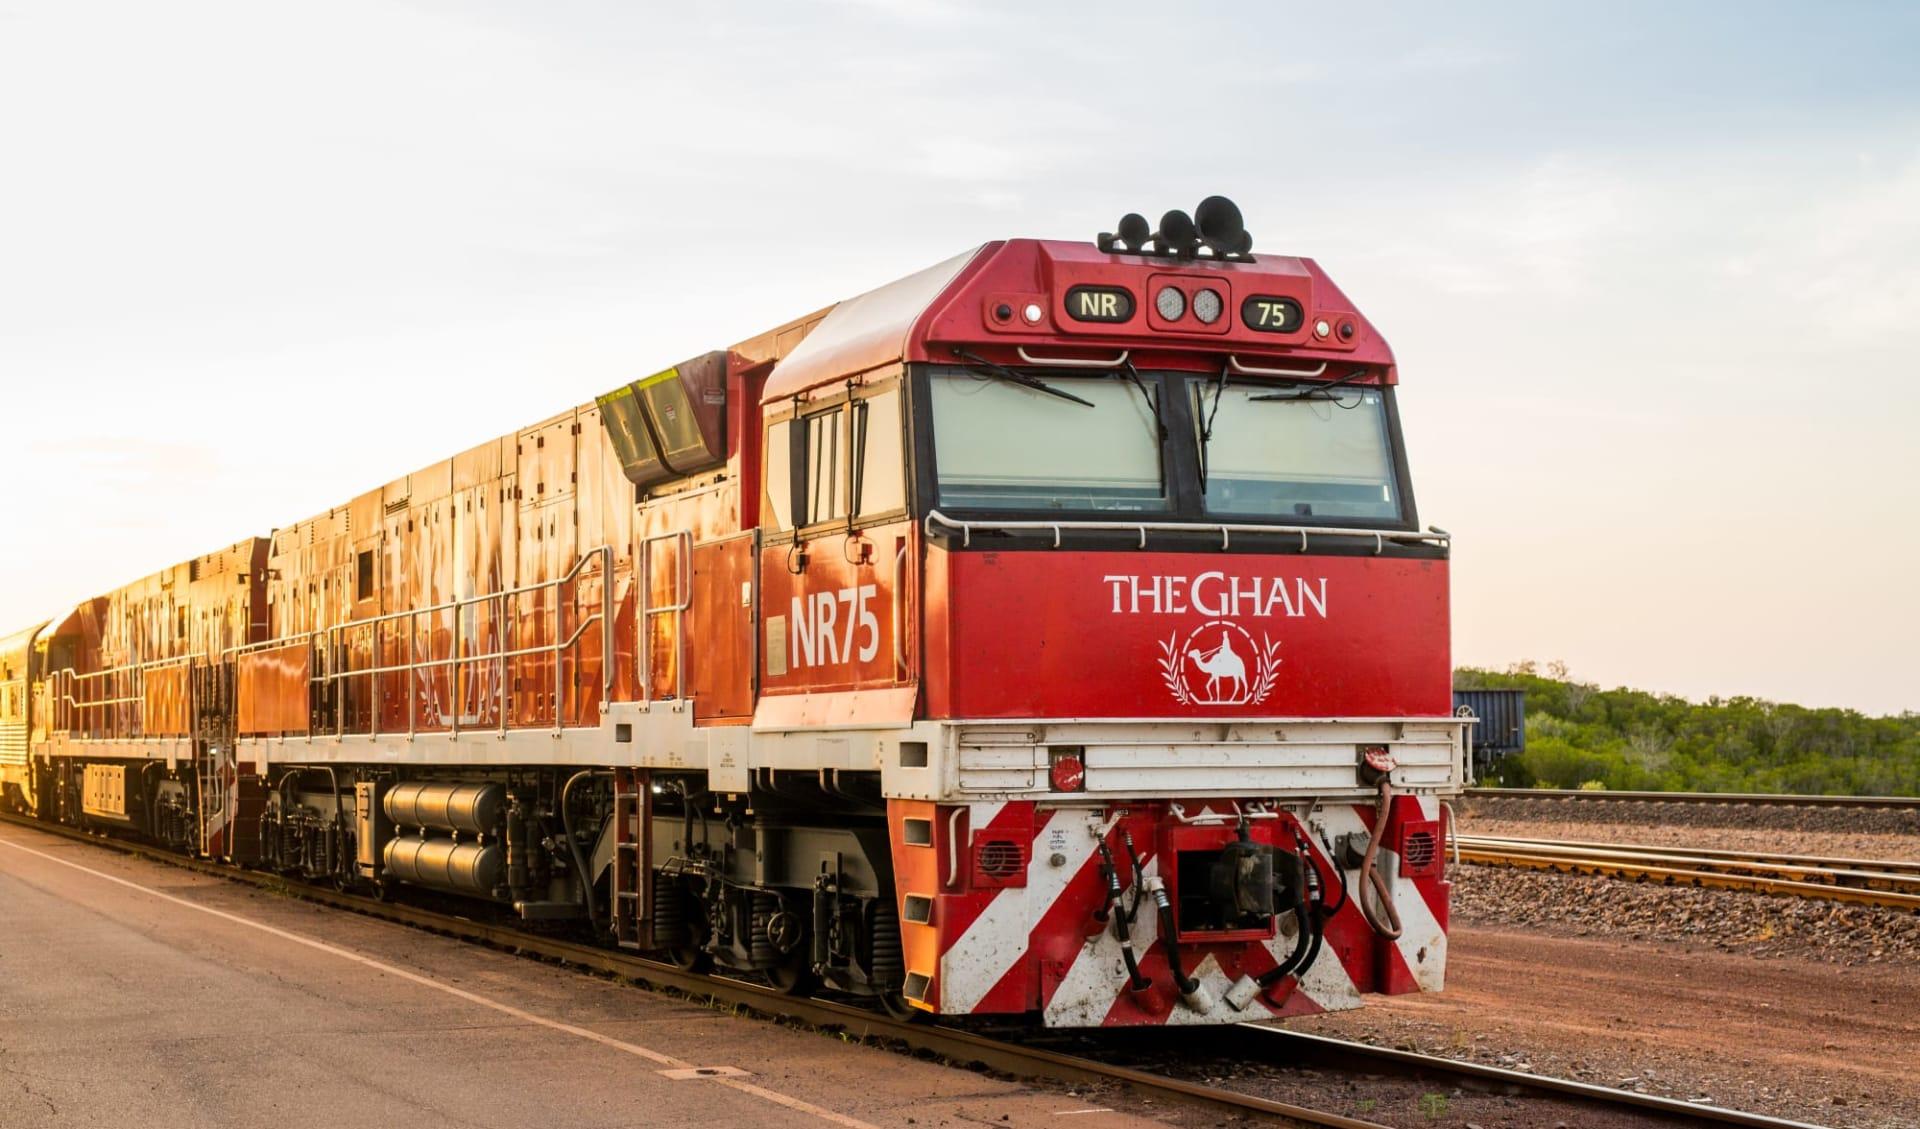 Kaleidoskop Australien (AAT Kings) ab Melbourne: Australien - Bahnreisen - The Ghan Lokomotive